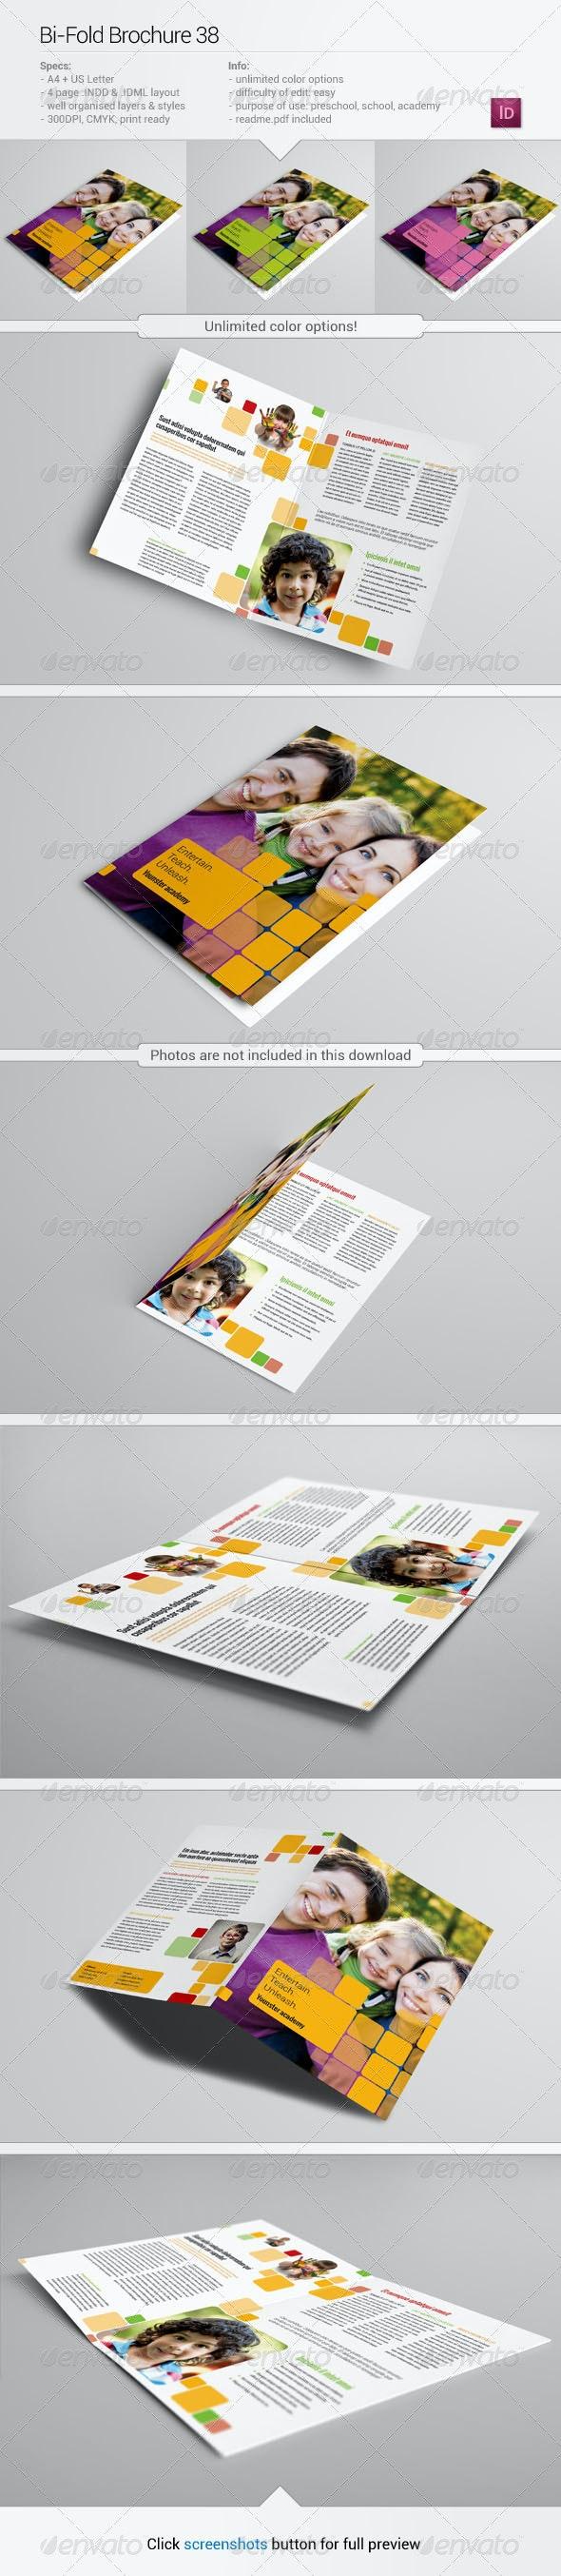 Bi-Fold Brochure 38 - Informational Brochures